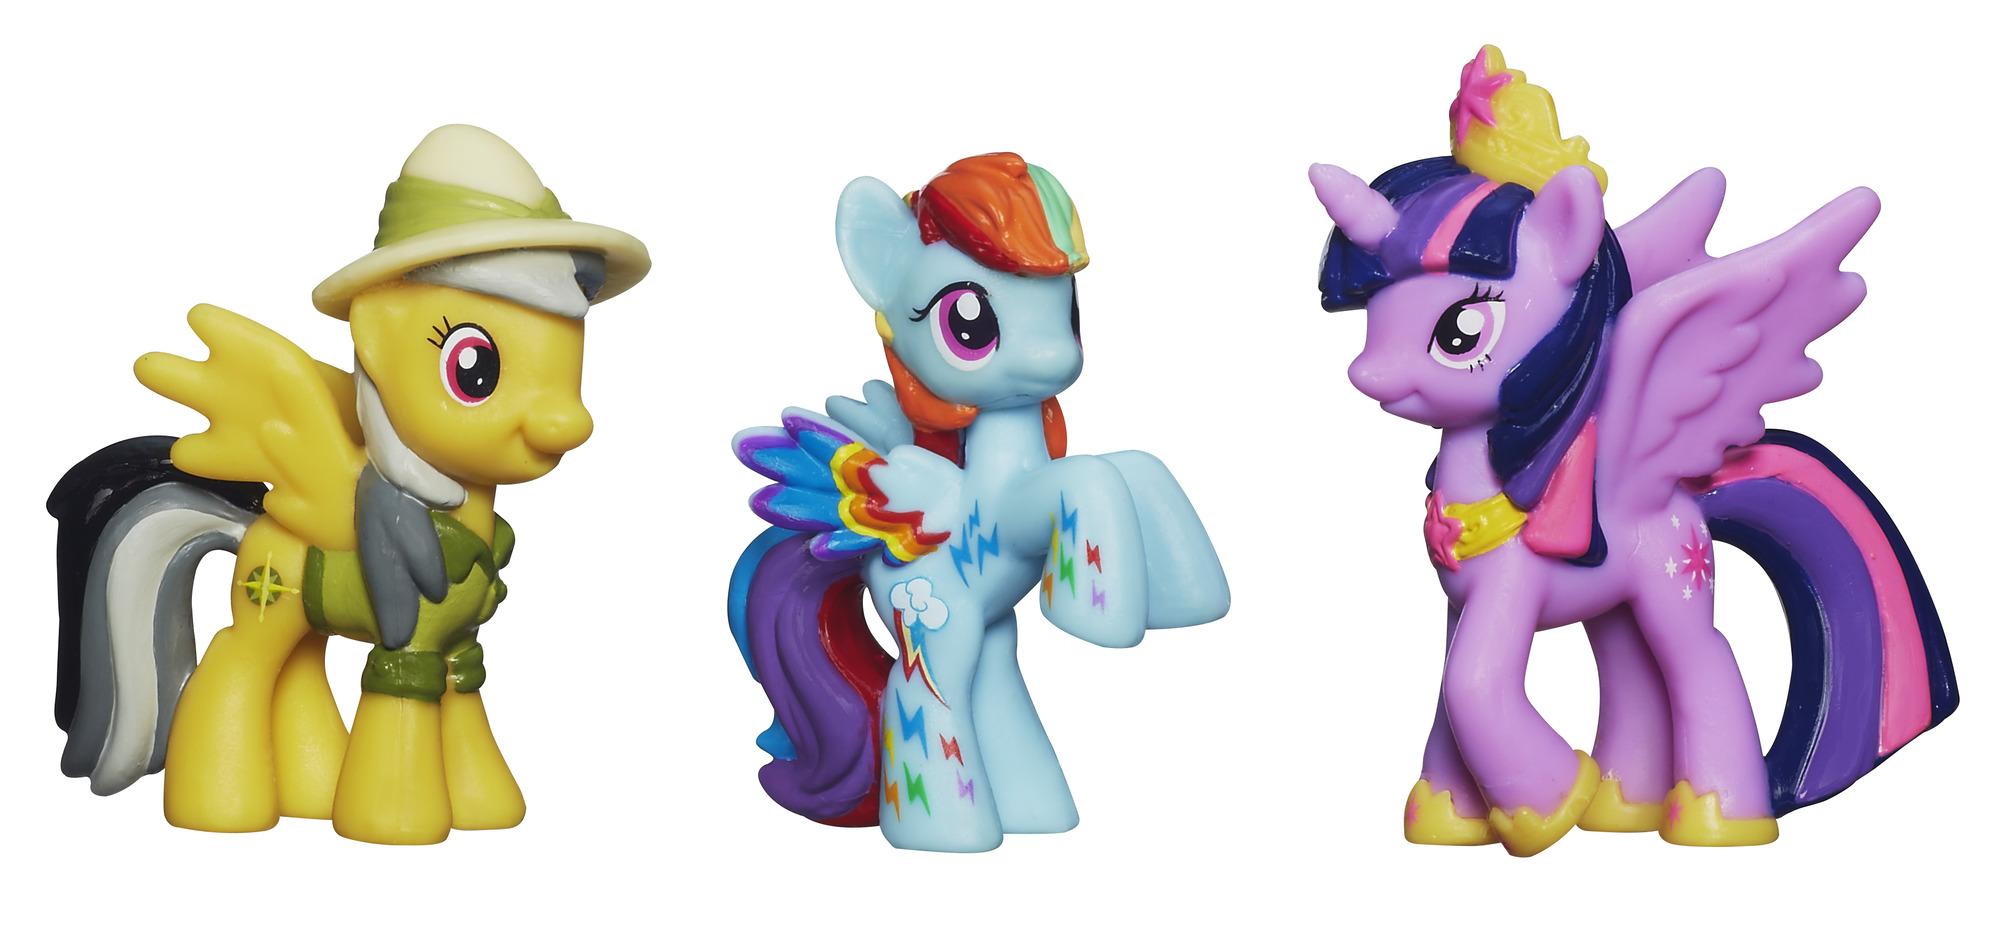 My Little Pony Daring Pony Story Set by Hasbro